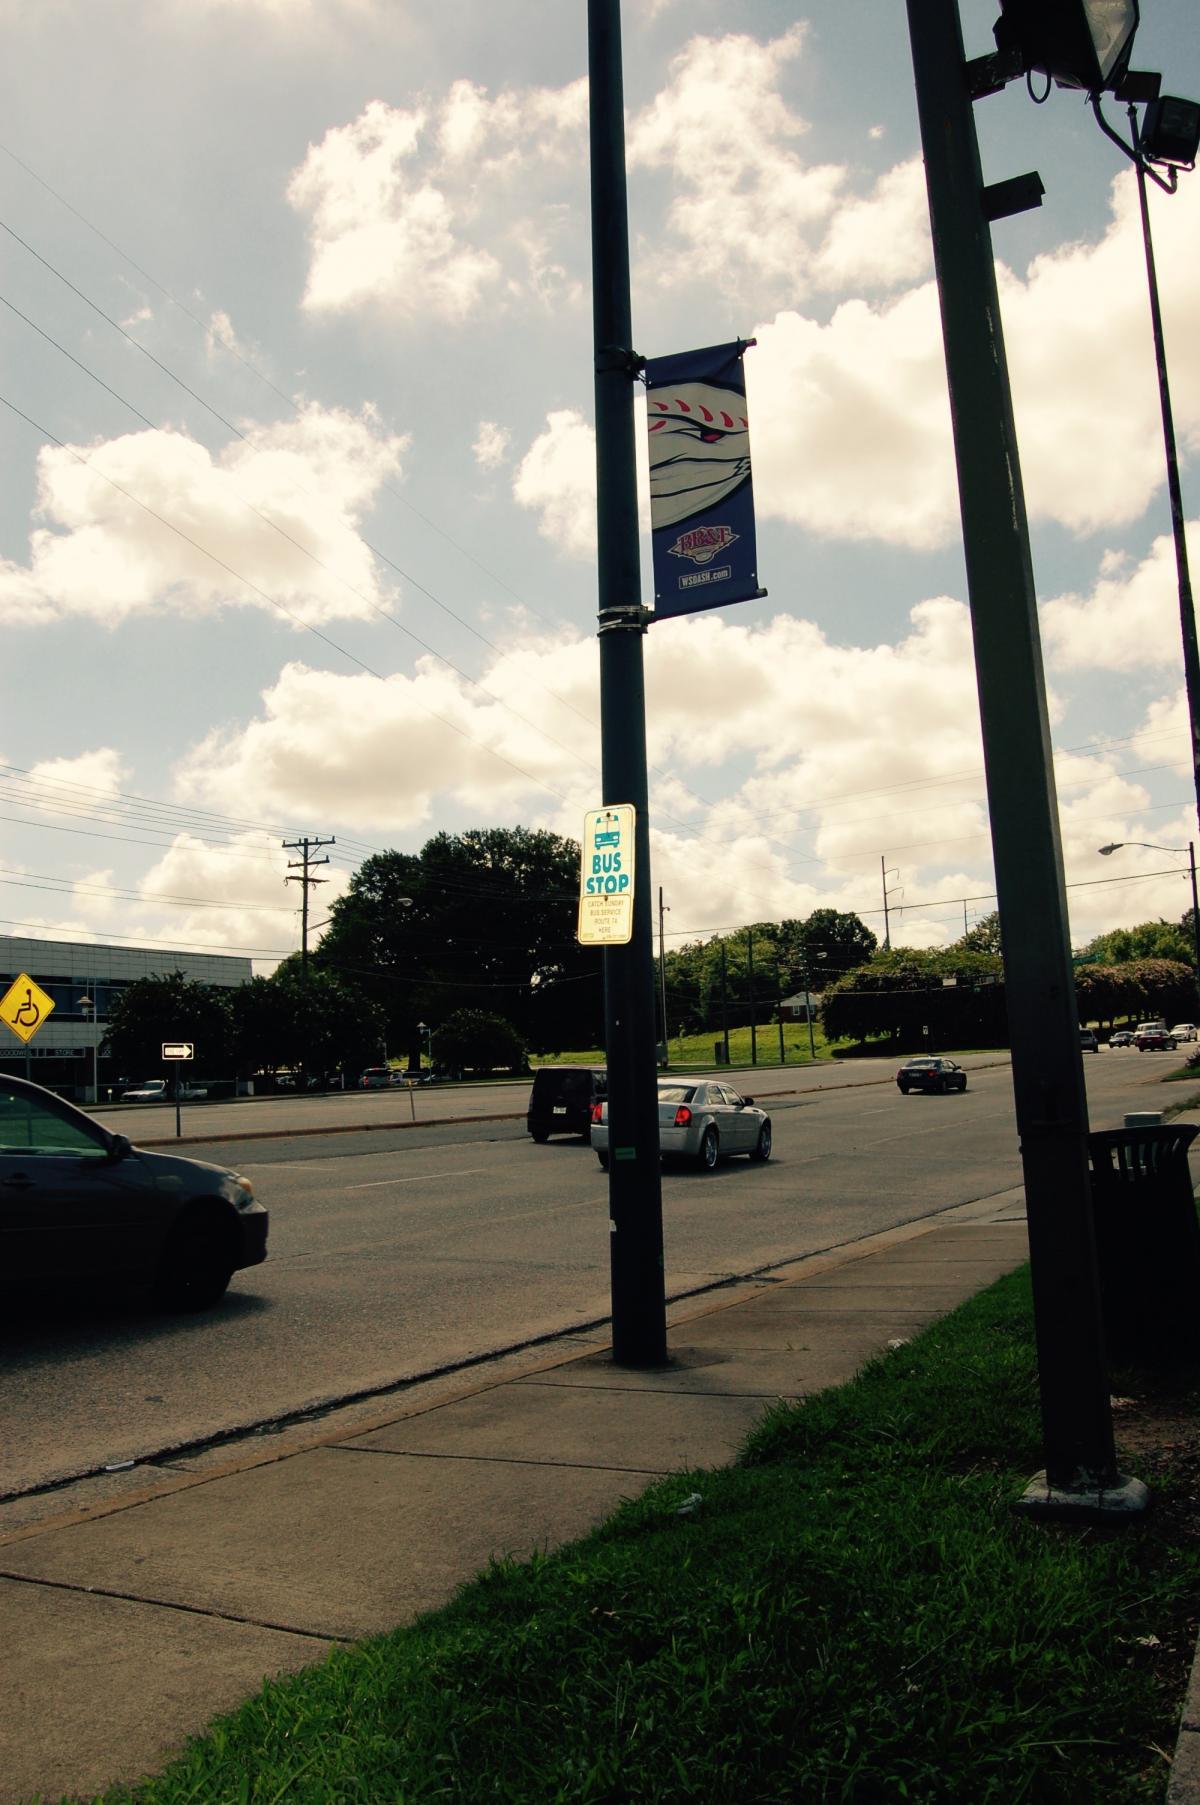 WSTA Bus Stop on University Parkway Blvd.